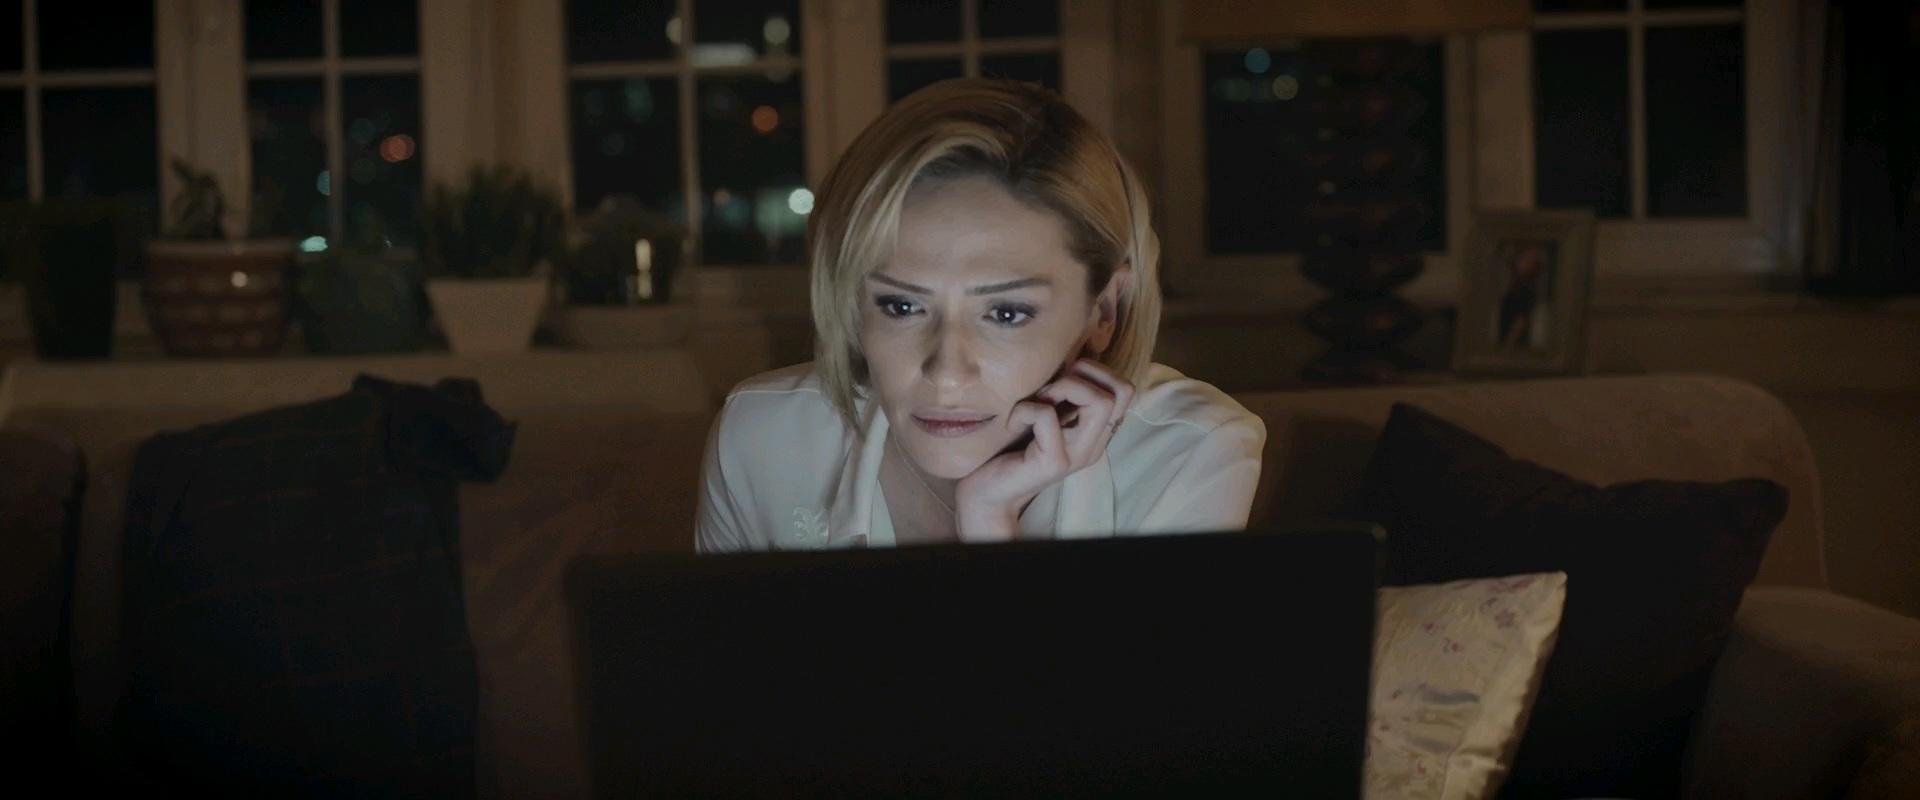 Ayla   2017   Yerli Film   WEB-DL   XviD   Sansürsüz   1080p - m720p - m1080p   WEB-DL   Tek Link